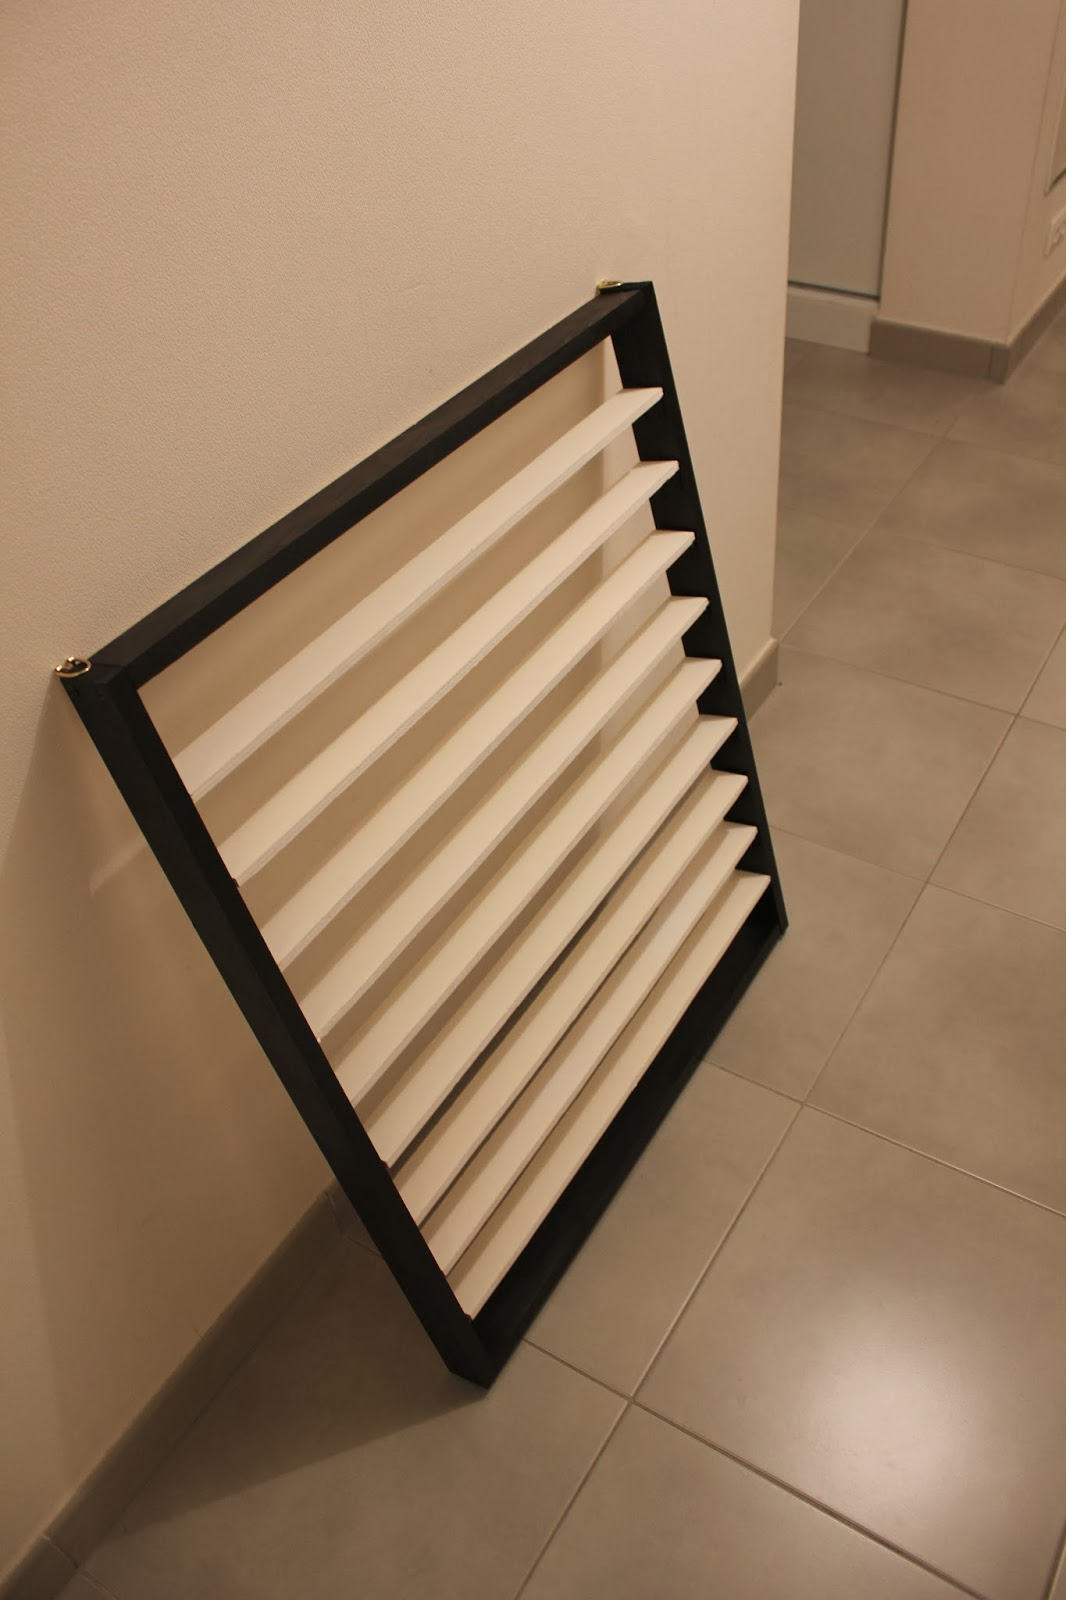 lego fada diy etag re murale. Black Bedroom Furniture Sets. Home Design Ideas